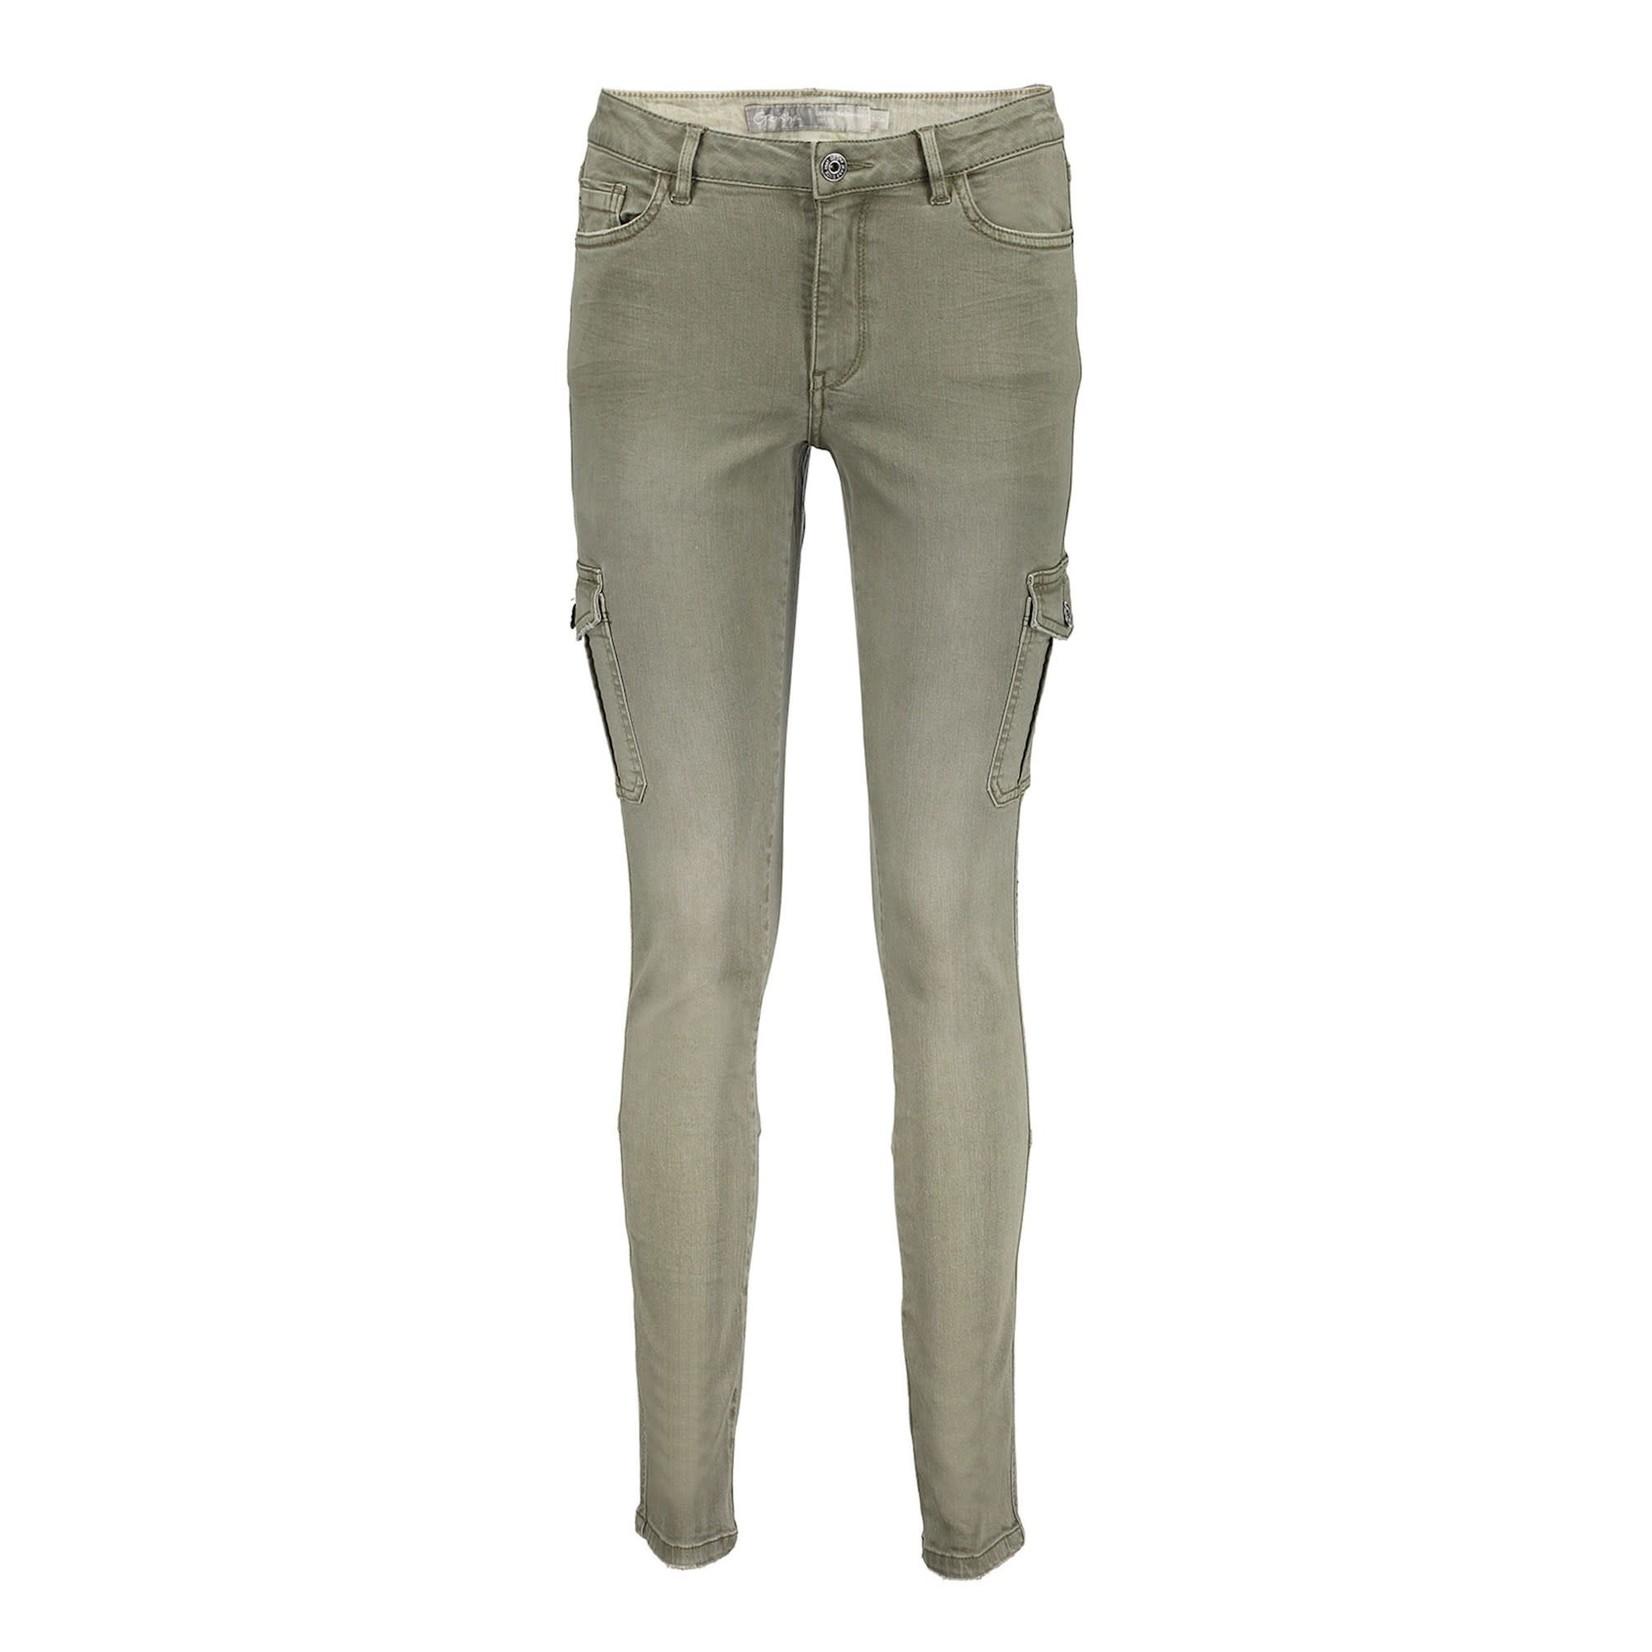 Geisha Geisha Cargo Pants army 11507-10